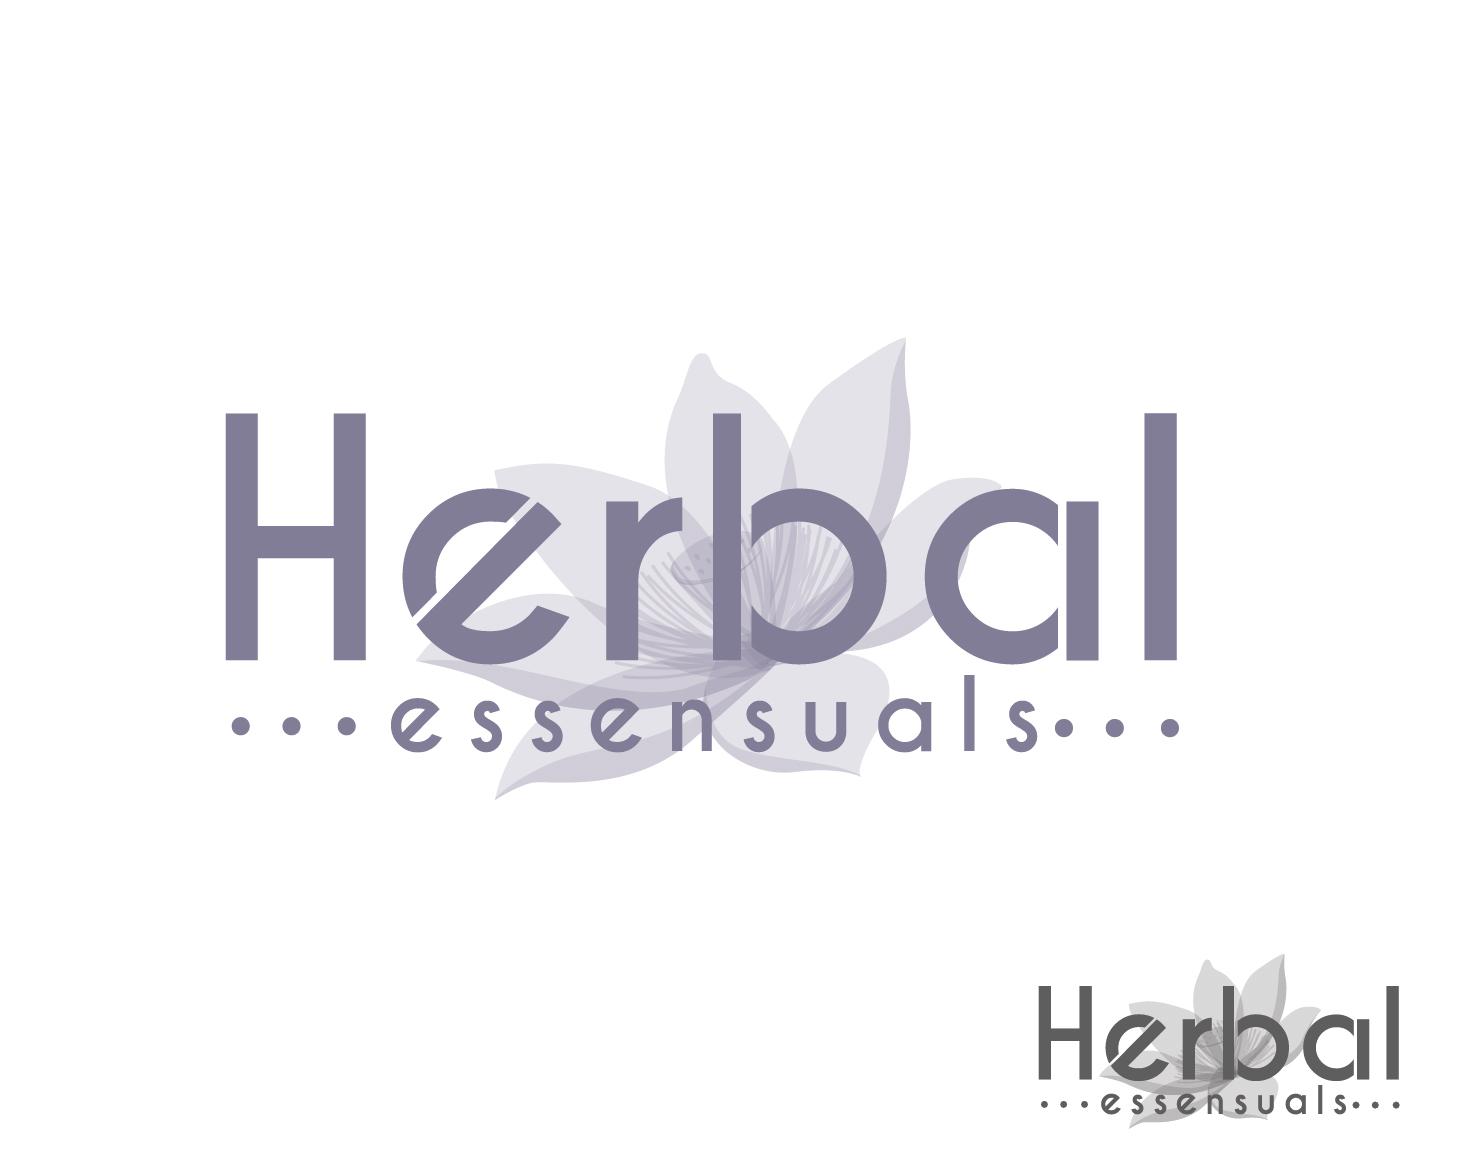 Logo Design by VENTSISLAV KOVACHEV - Entry No. 58 in the Logo Design Contest Captivating Logo Design for Herbal Essensuals.